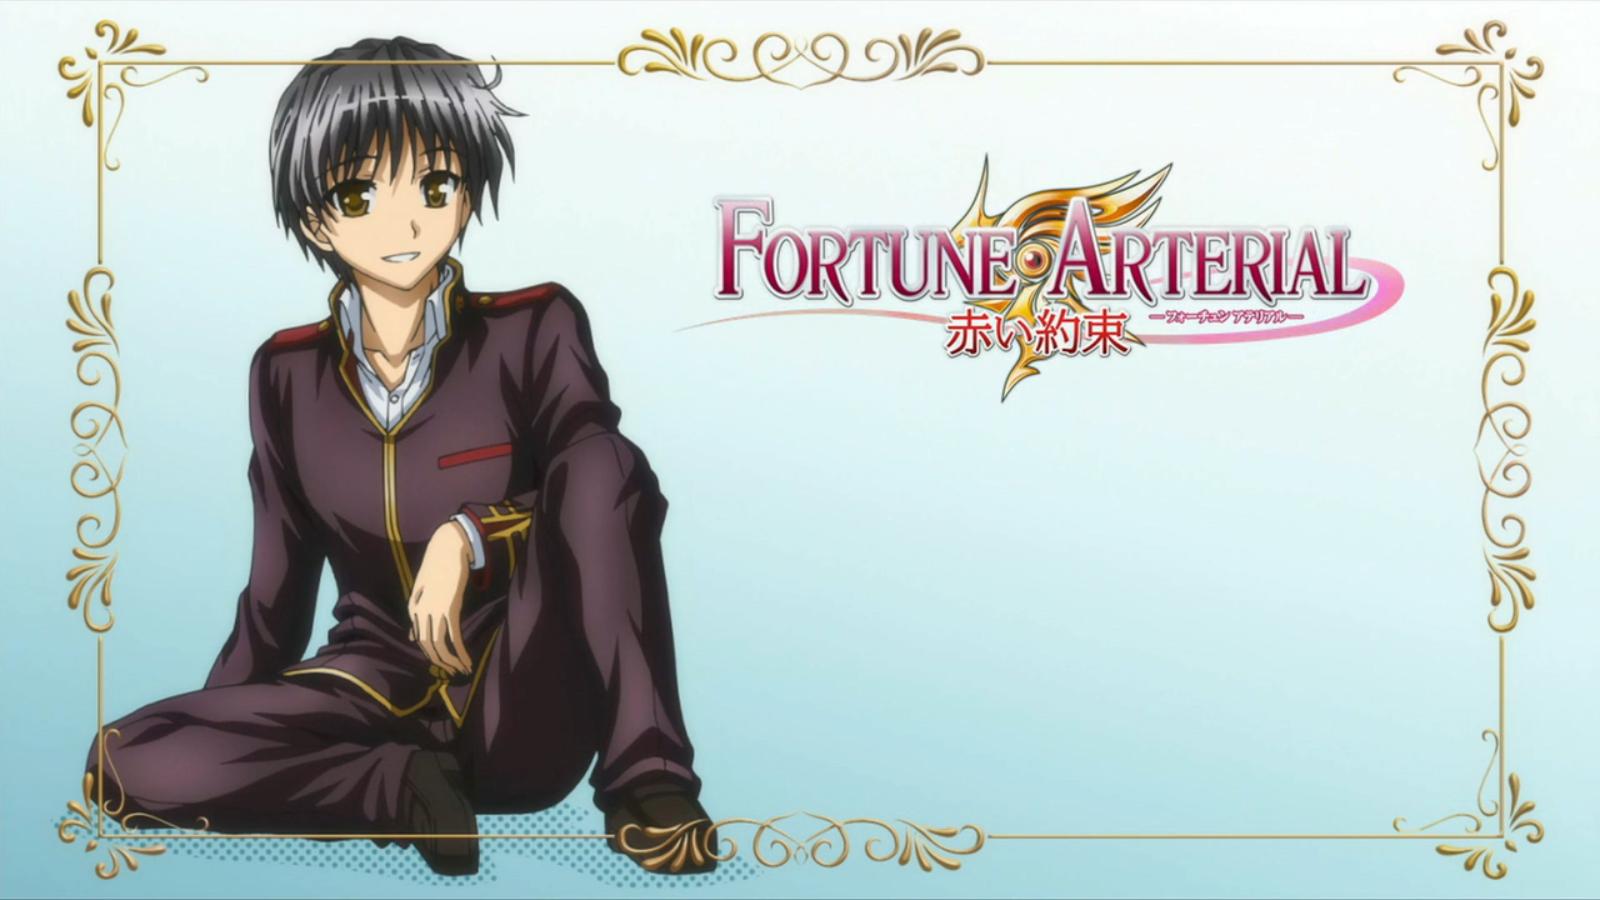 Fortune Arterial Kohei Hasekura